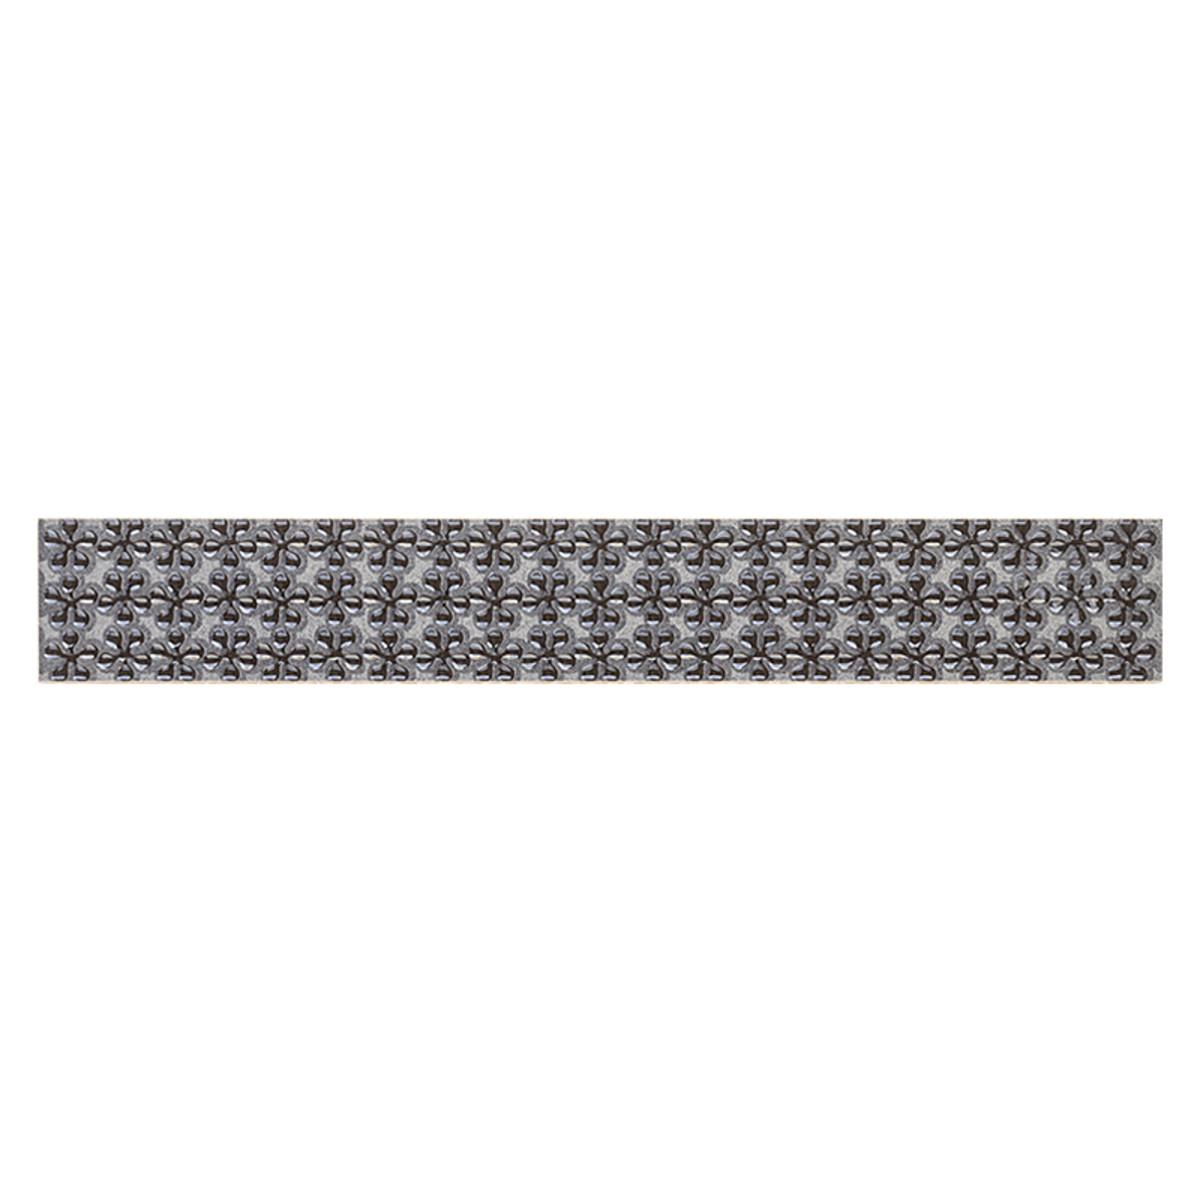 Бордюр FIRLETKA NERO listwa 48х333 см